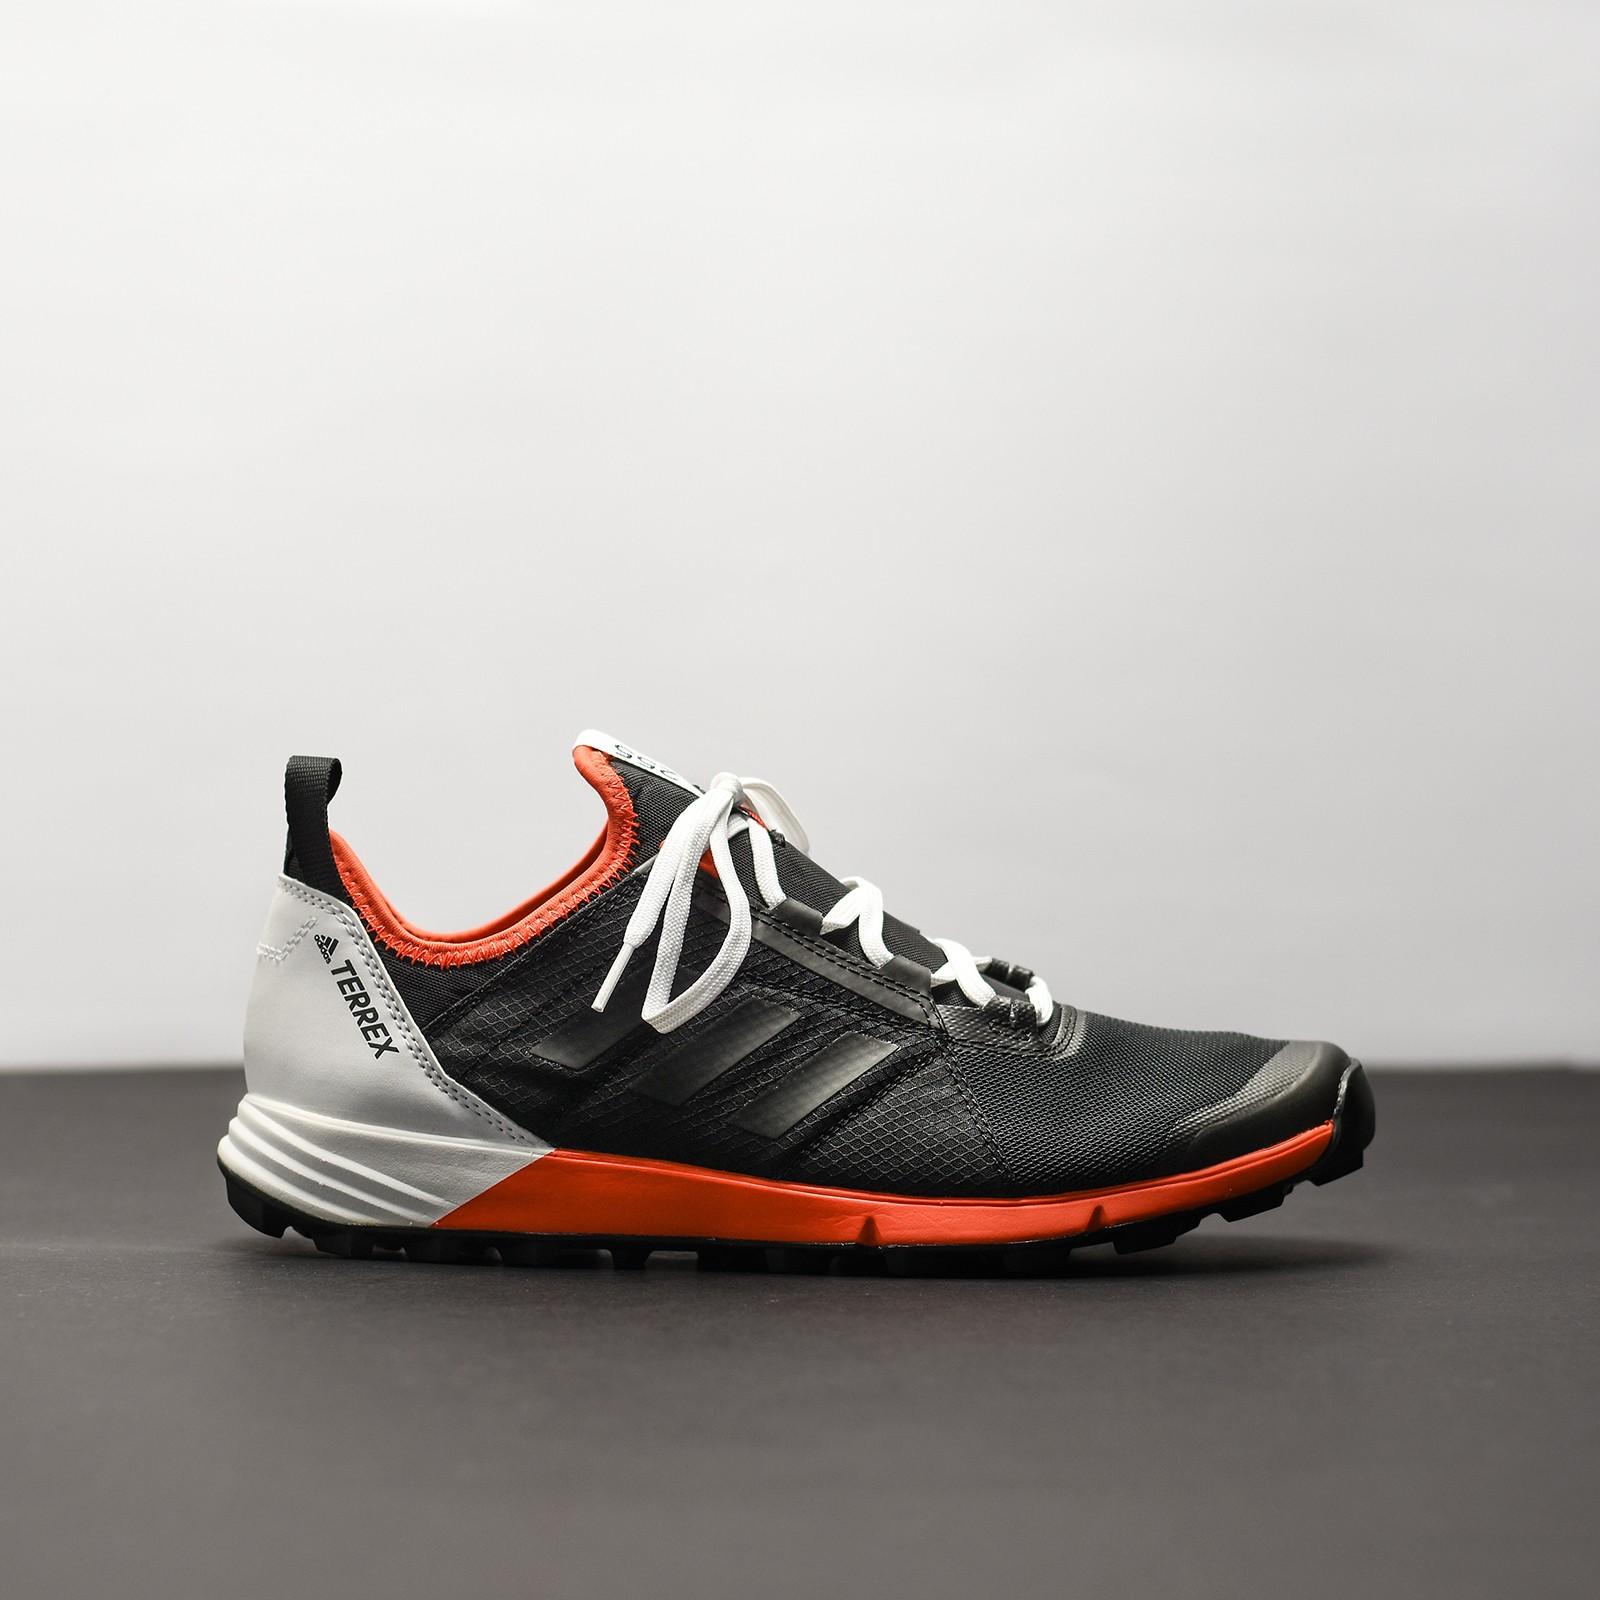 4fff0f71a11 Pánské Běžecké boty adidas Performance TERREX AGRAVIC SPEED